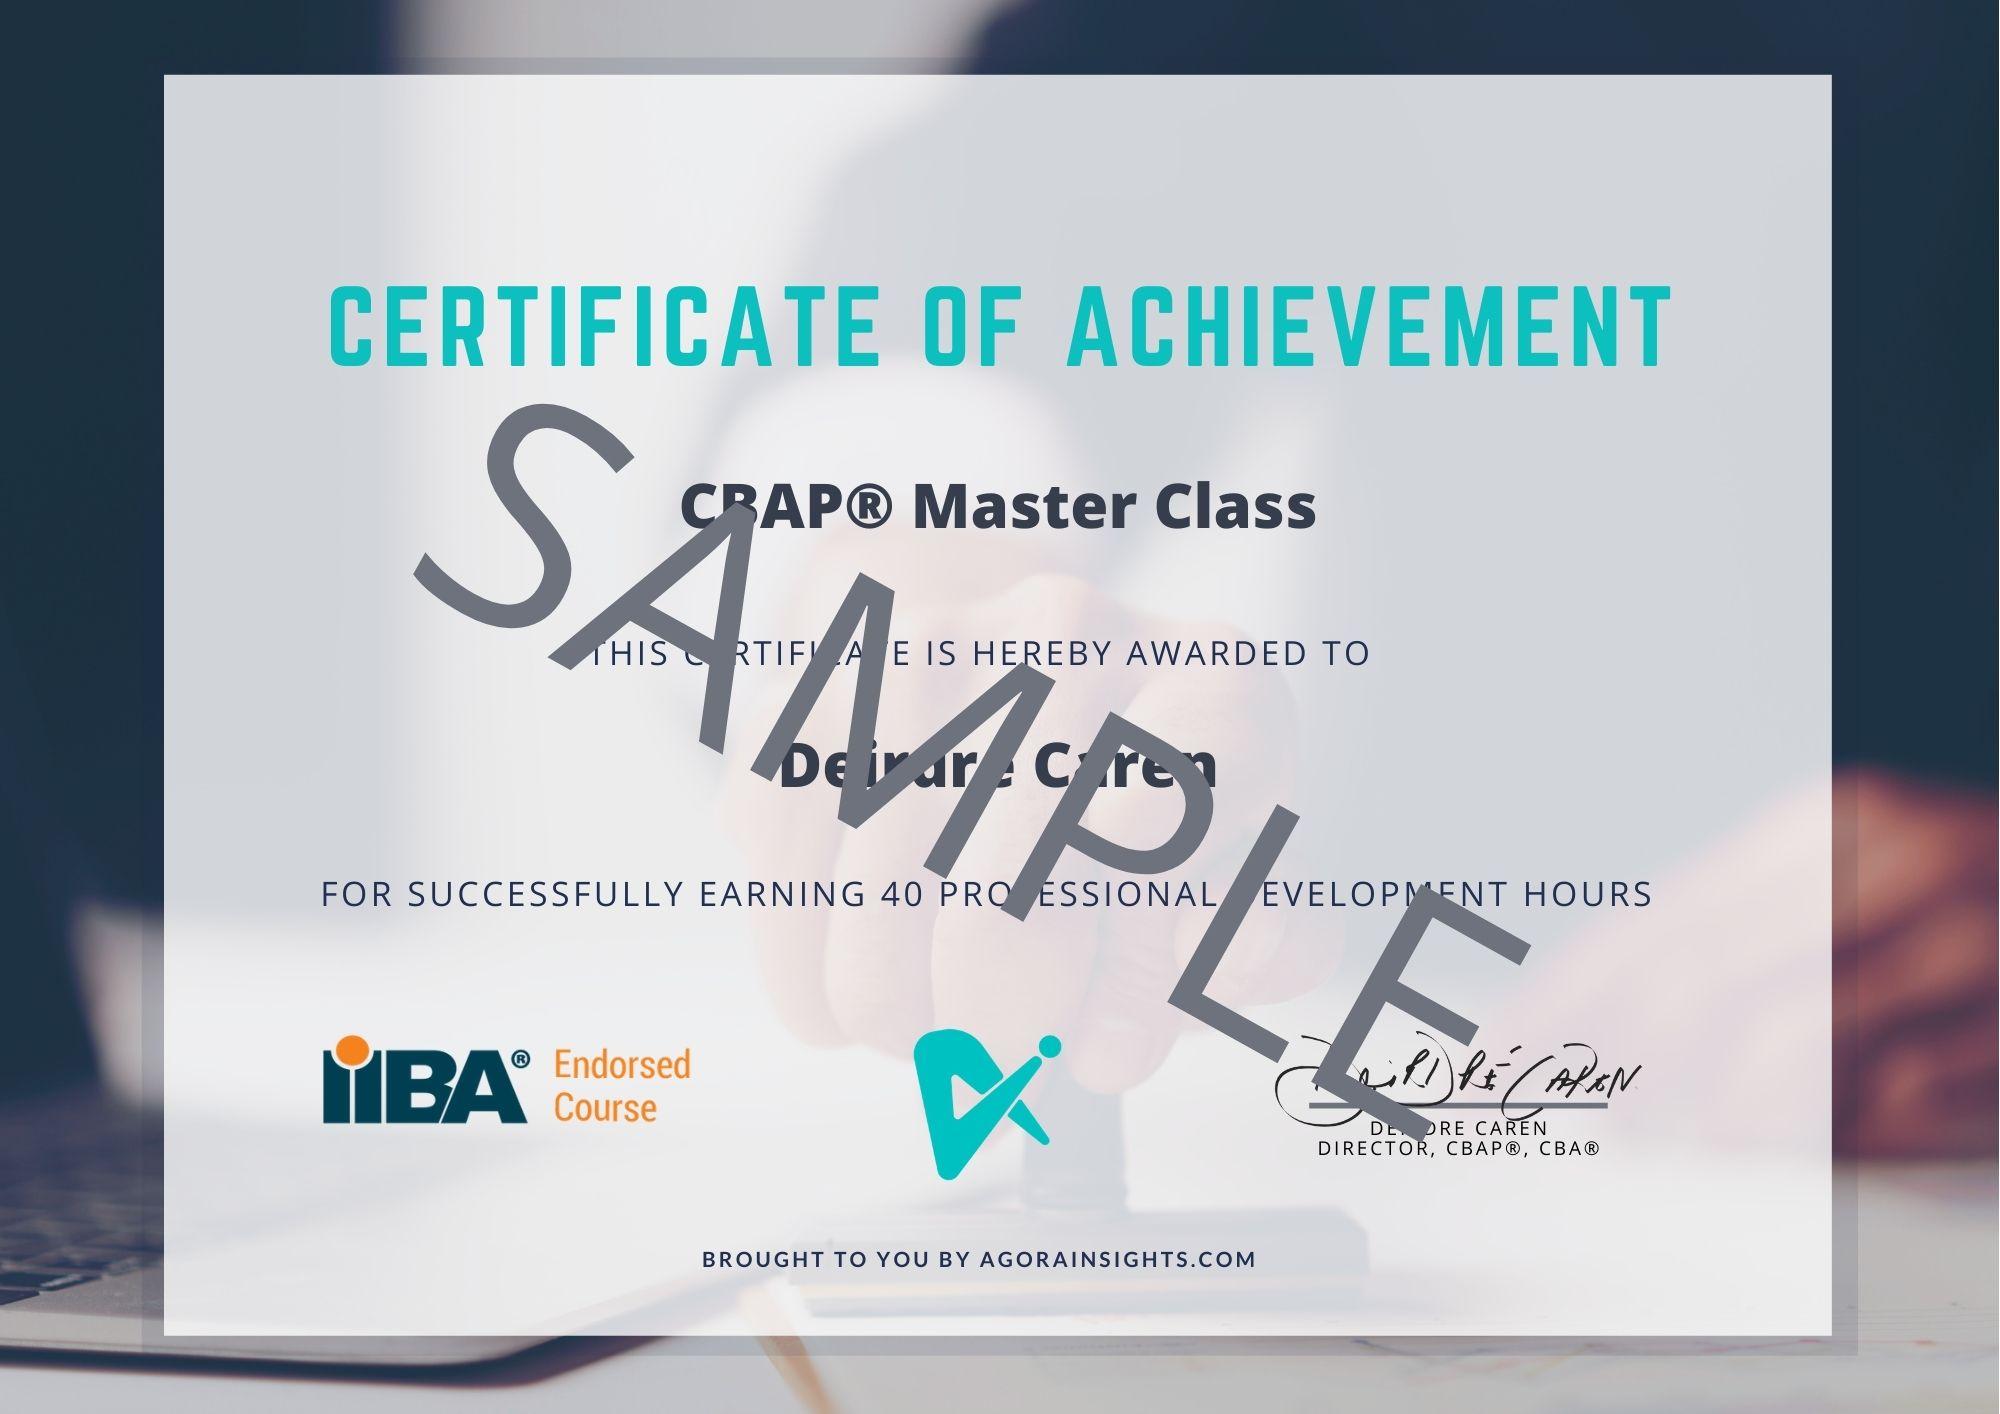 CBAP Master Class Certificate Sample